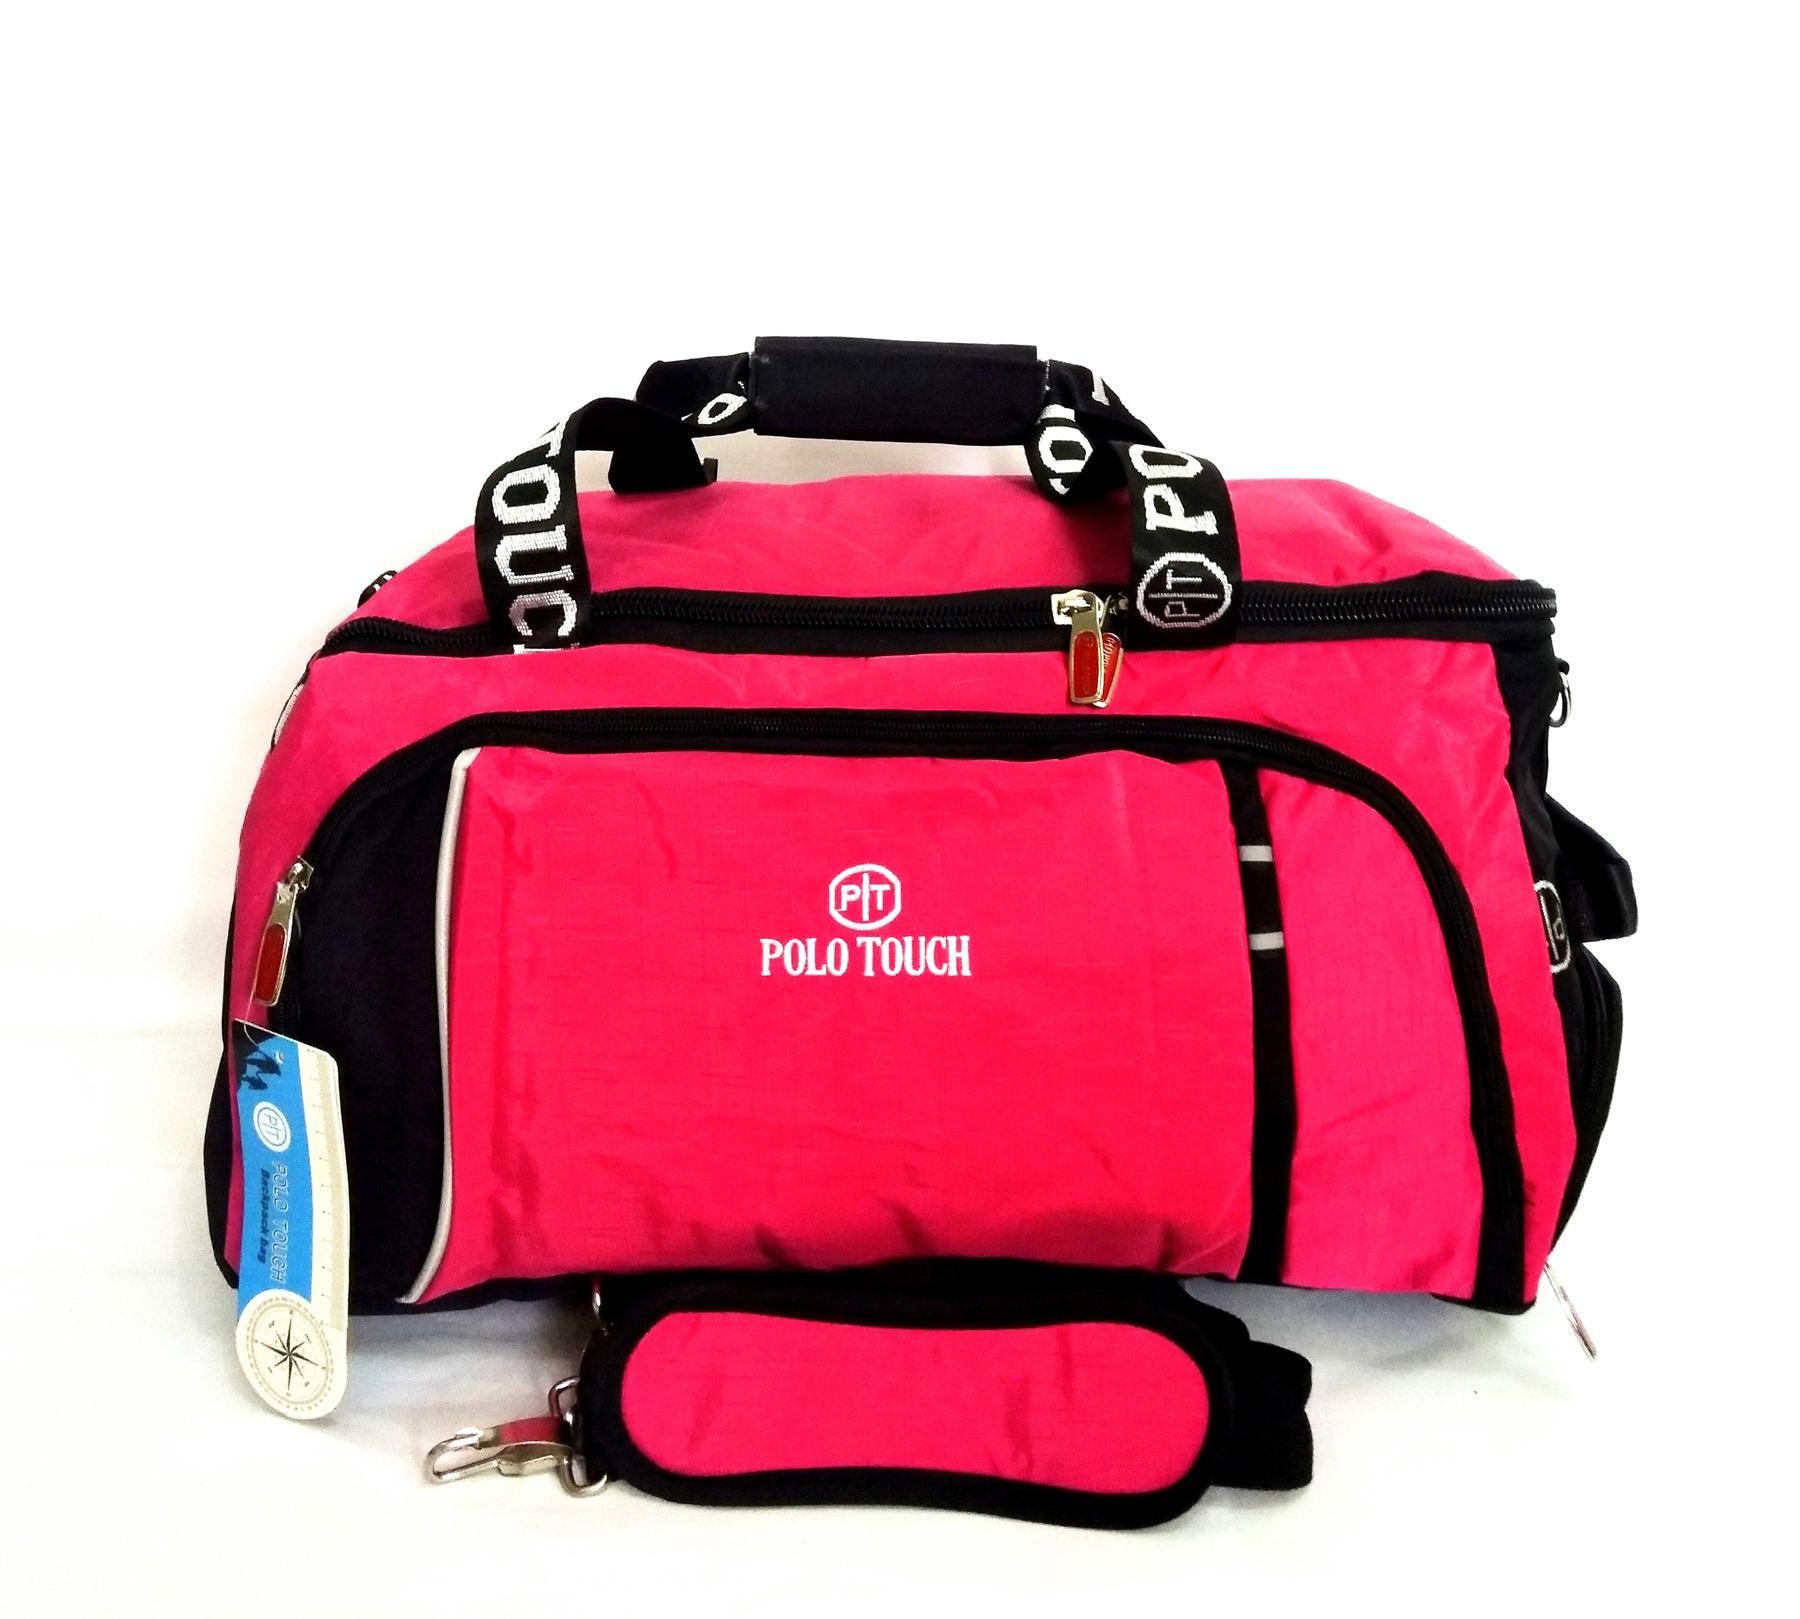 Tas Olahraga Futsal Gym Travel Bag Medium Polo Touch Ada Slot Sepatu By Tendakaki5.